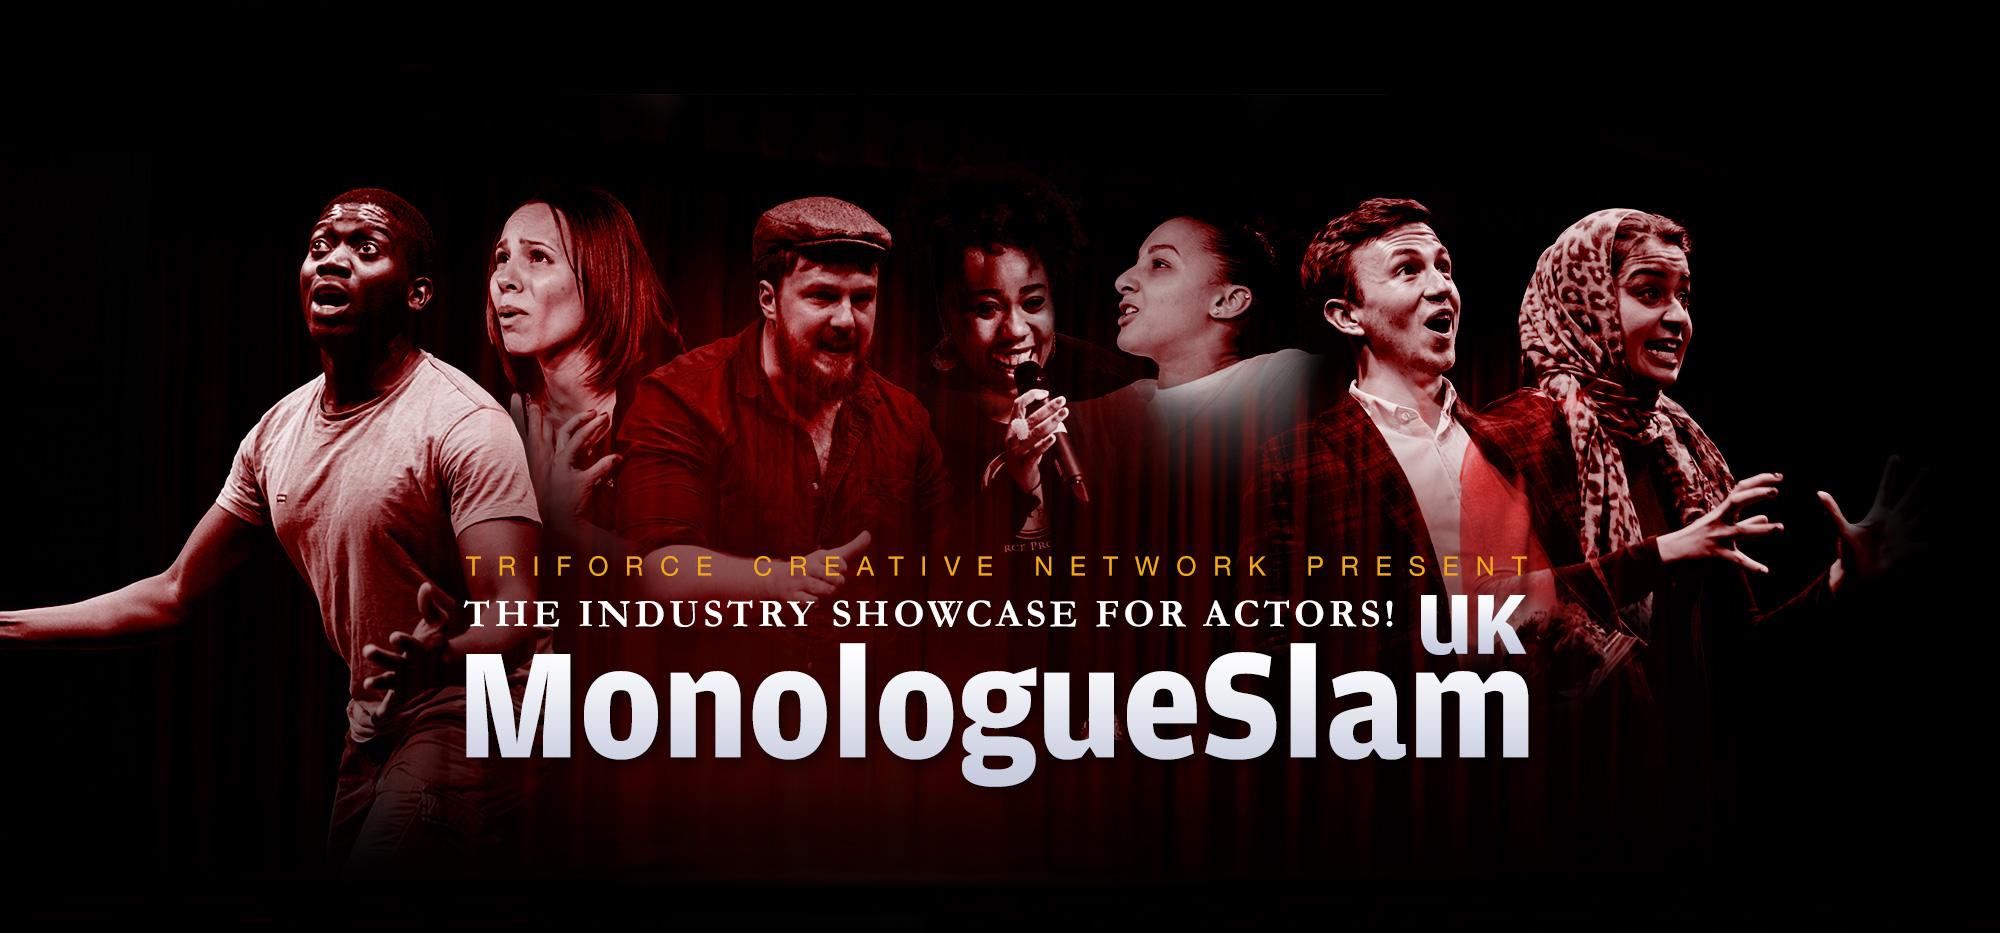 MonologueSlamUK.jpg